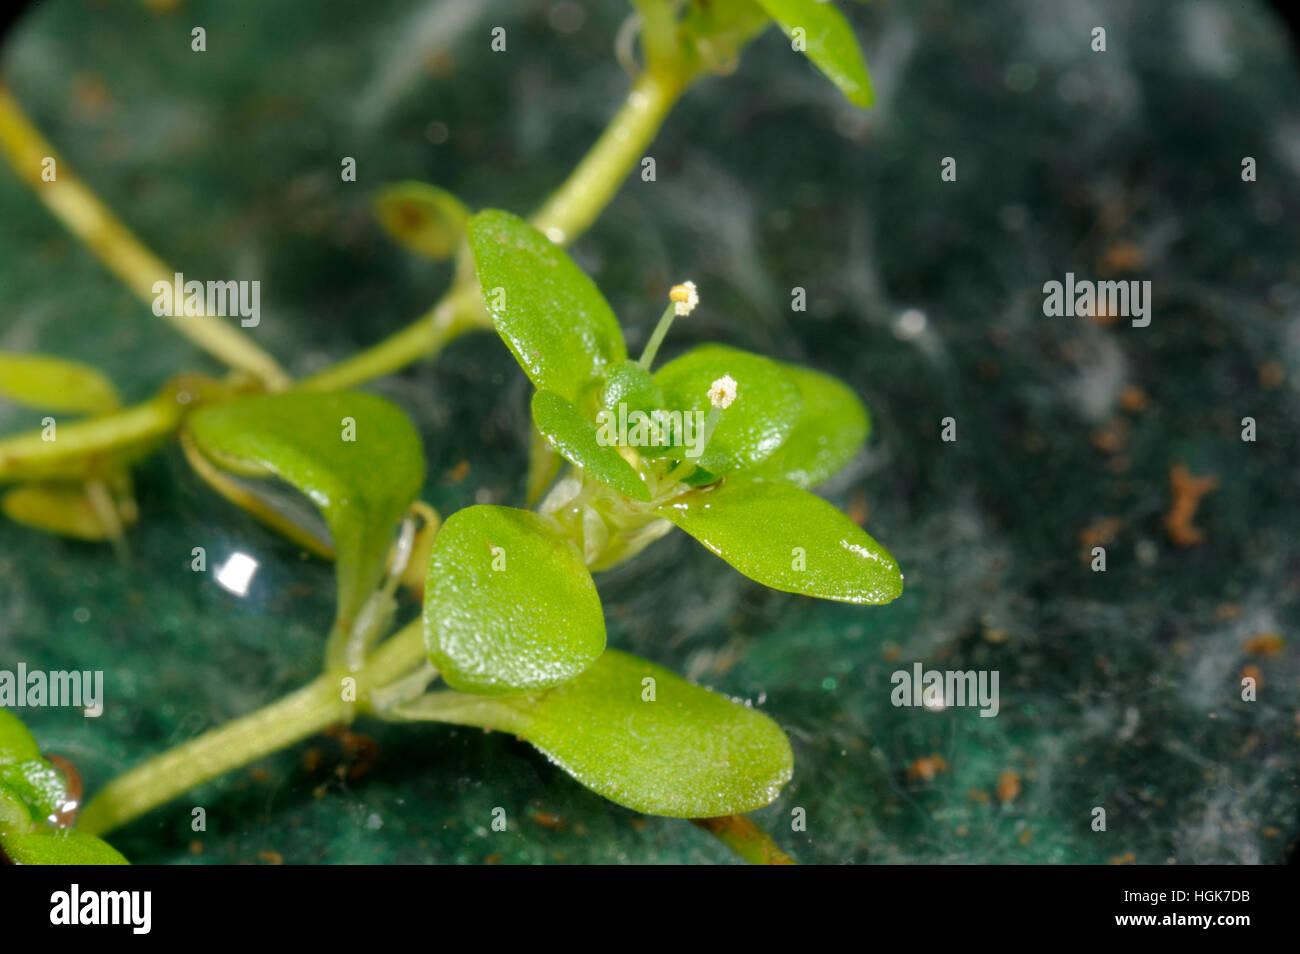 Common Water-starwort, Callitriche stagnalis - Stock Image